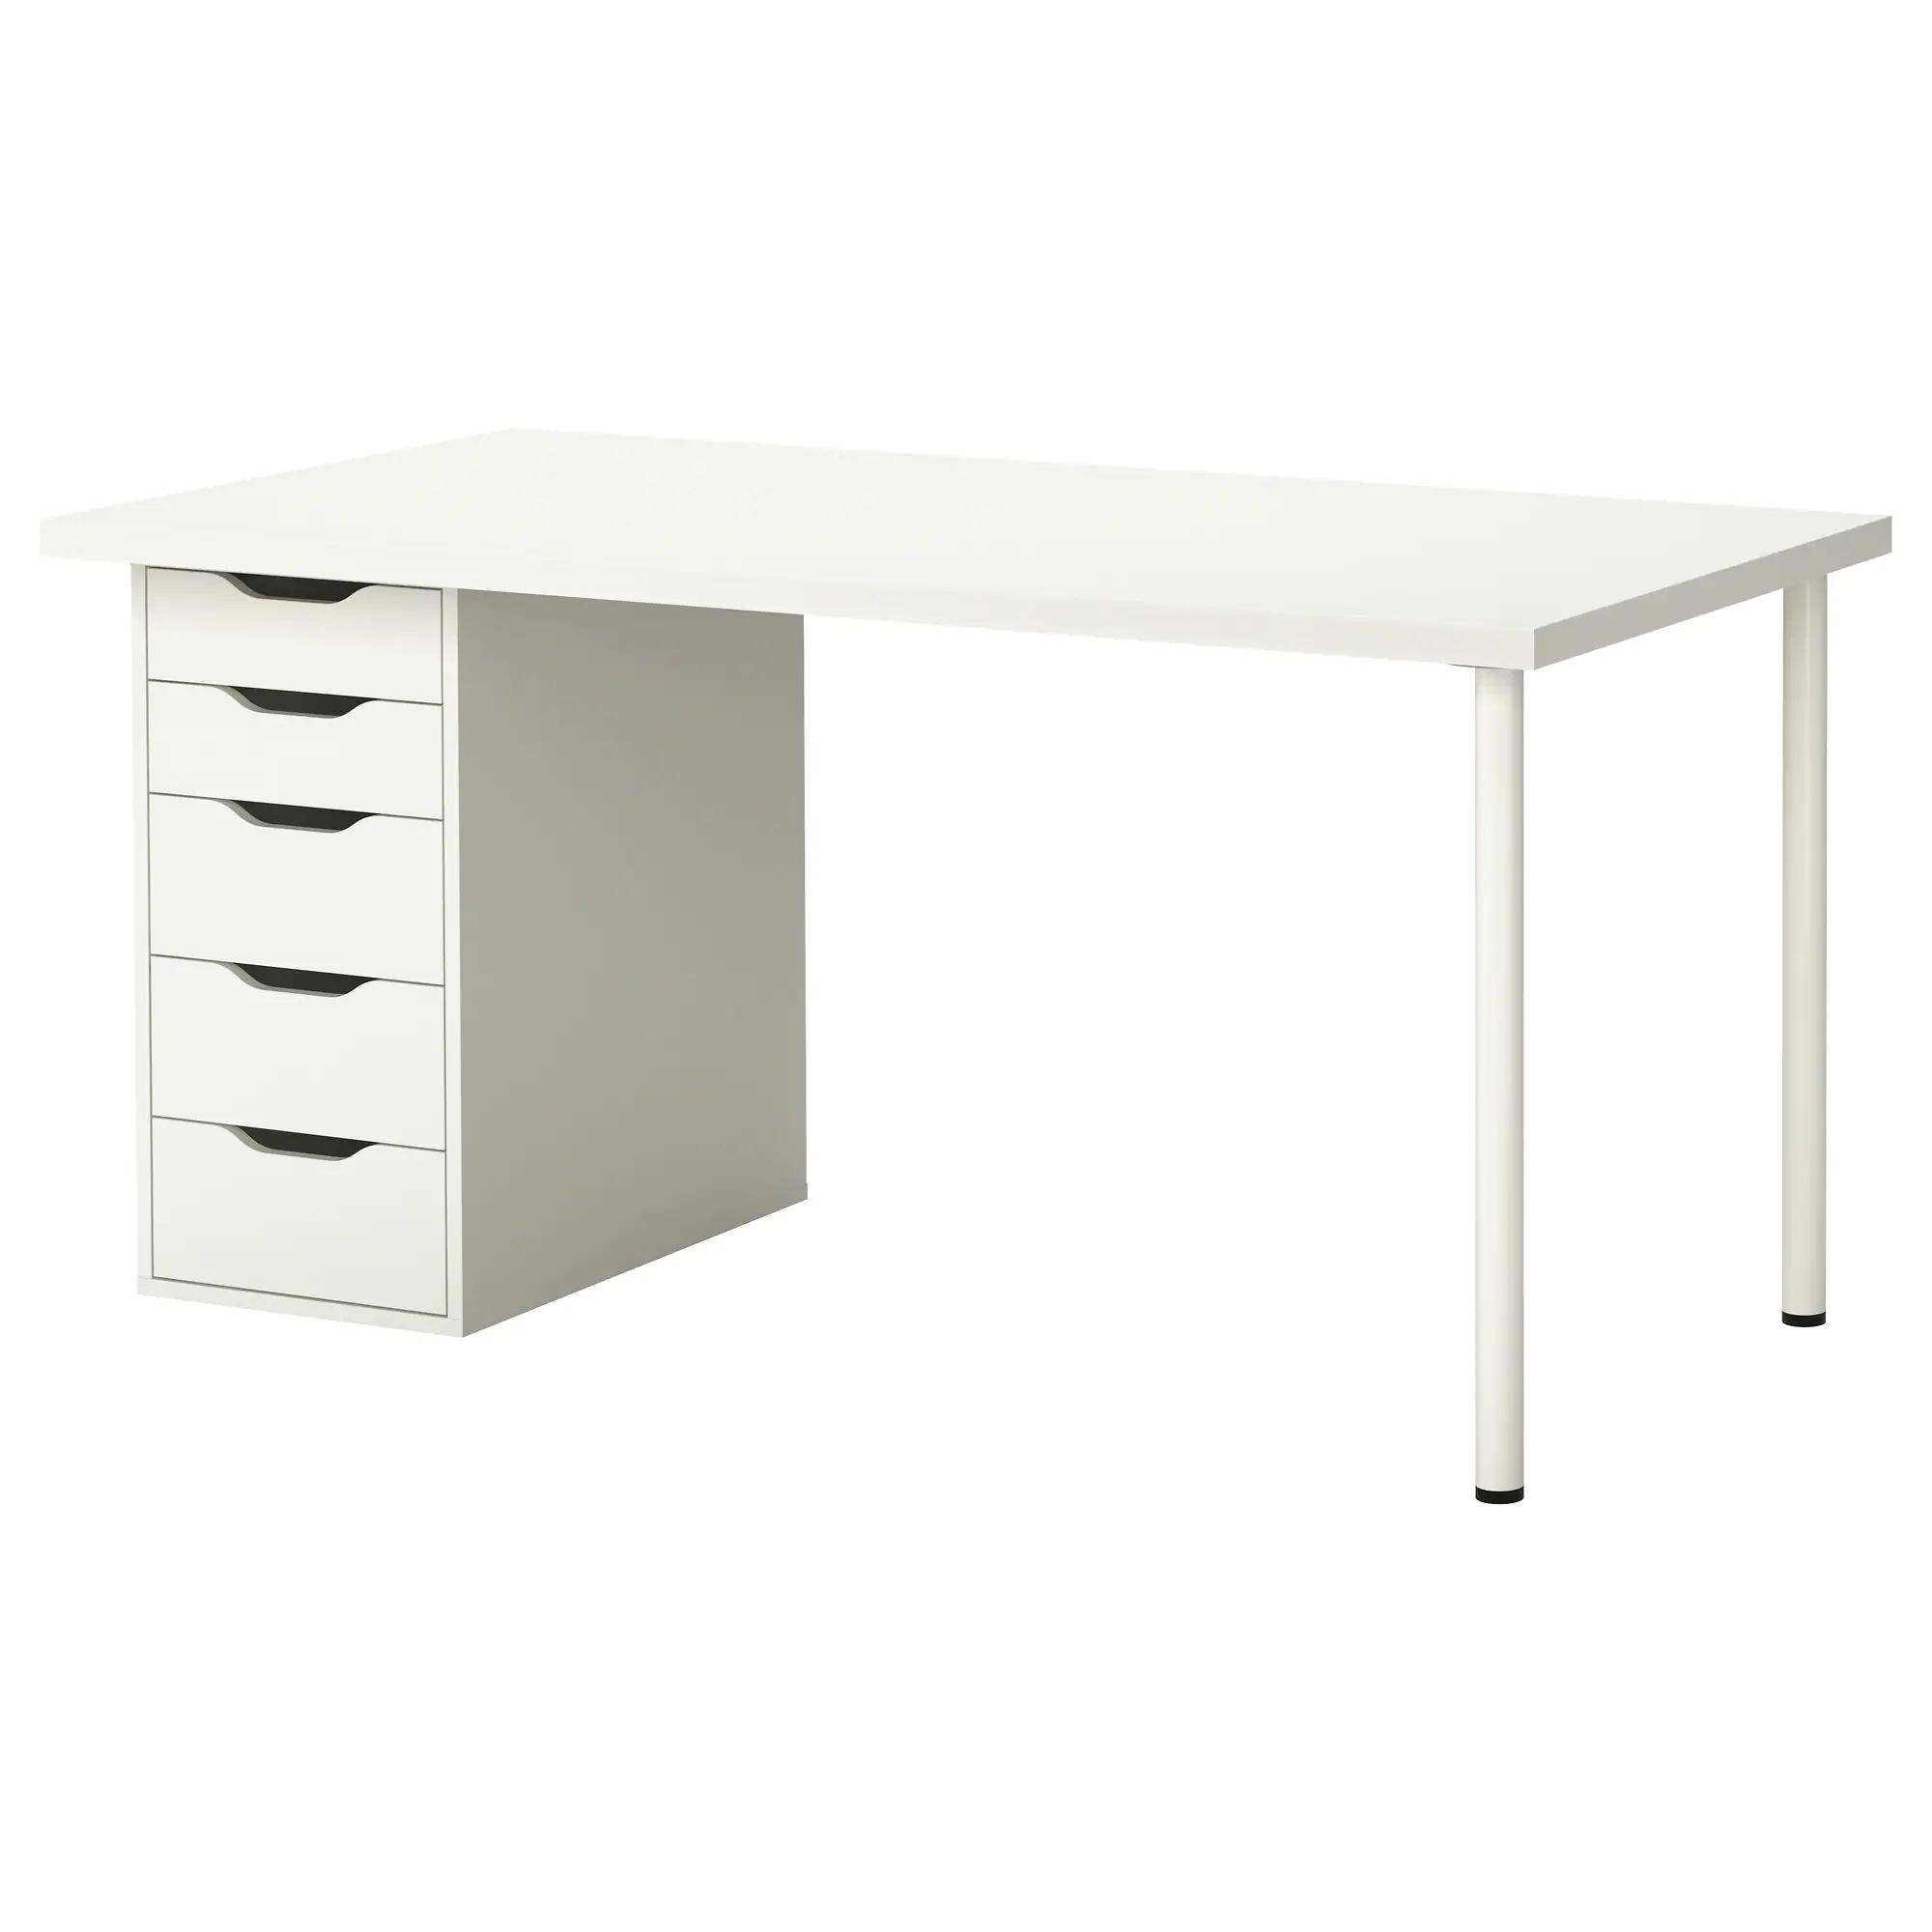 Linnmon Alex Table White 59x29 1 2 Ikea Home Office Furniture Ikea Home